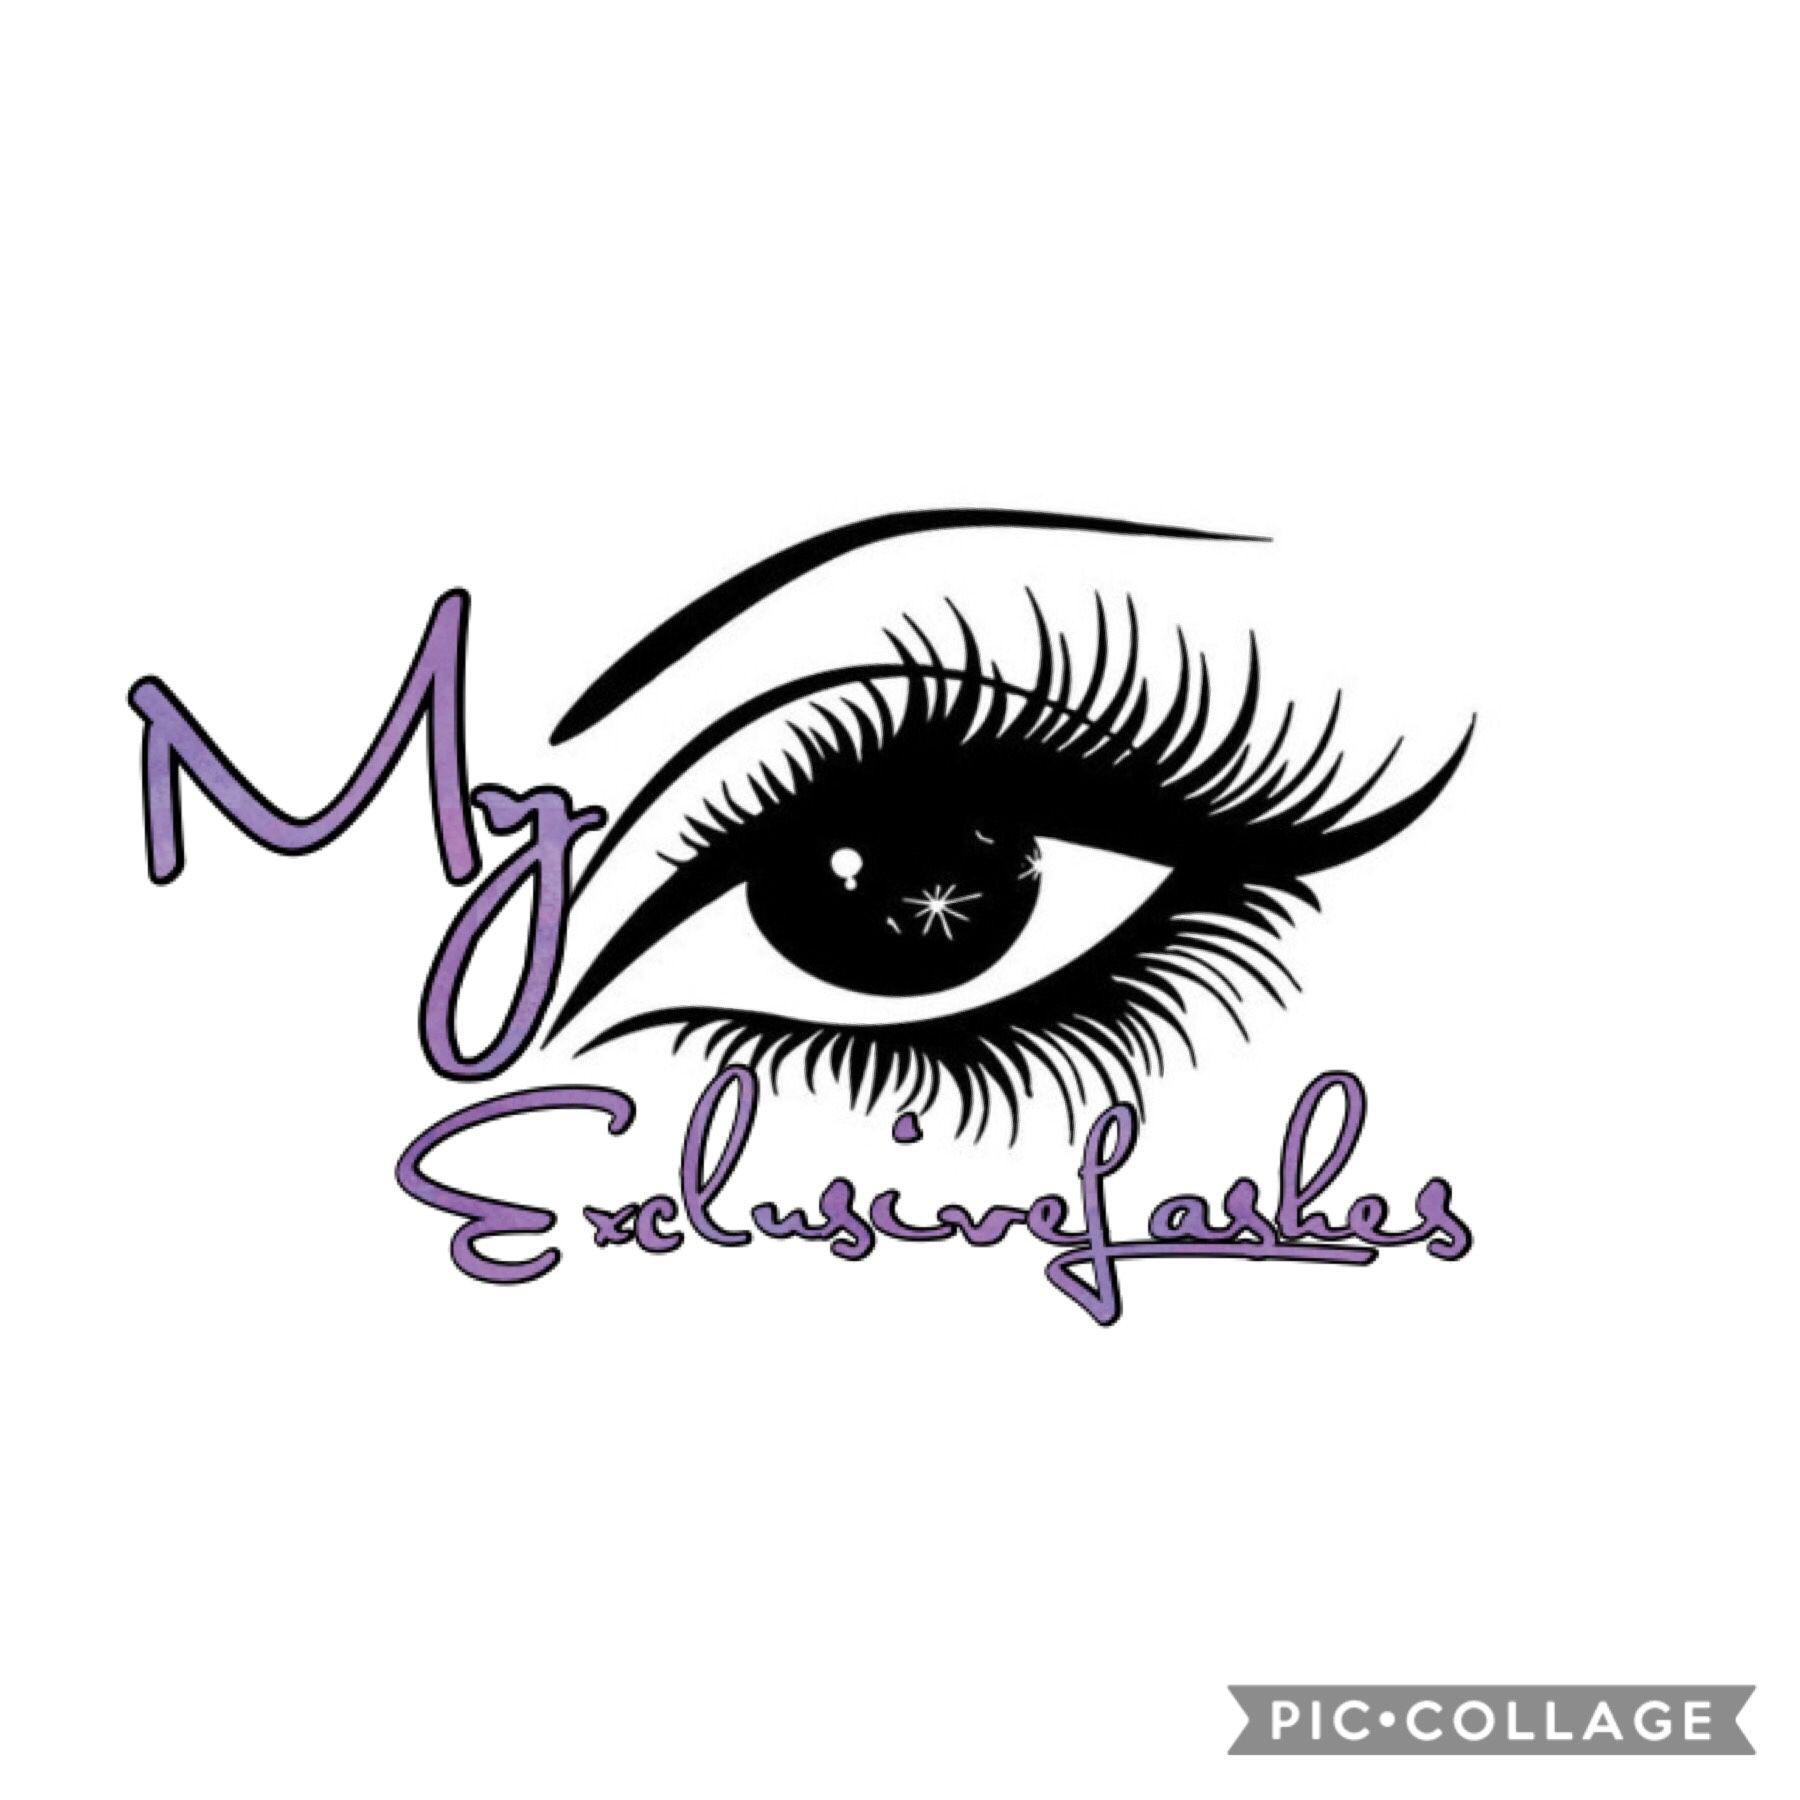 Mink eyelash extensions today